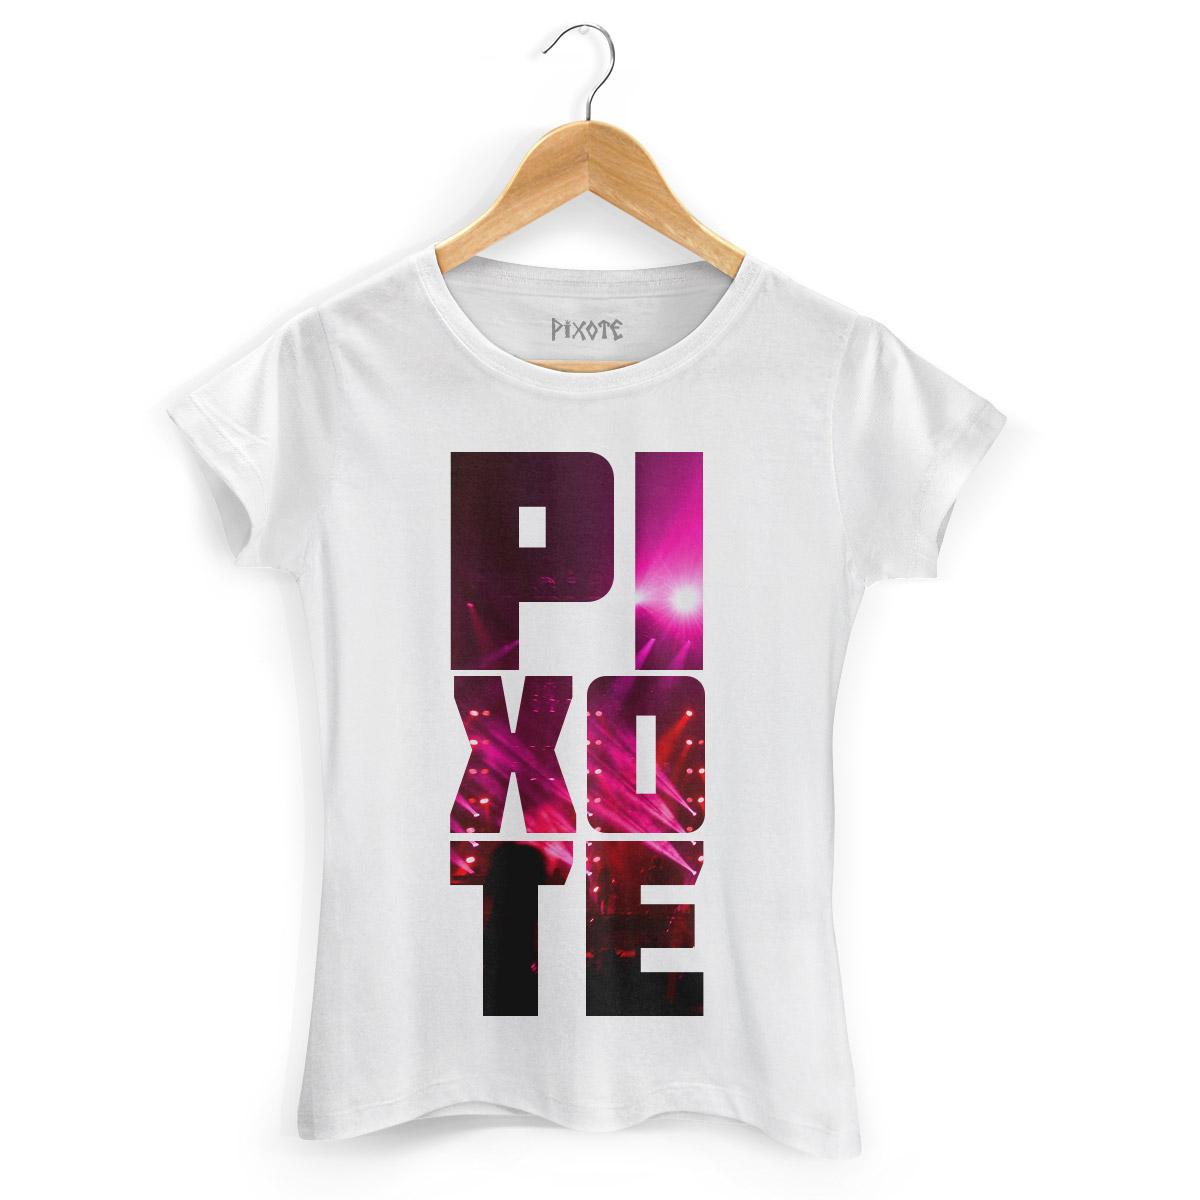 Camiseta Feminina Pixote Lights